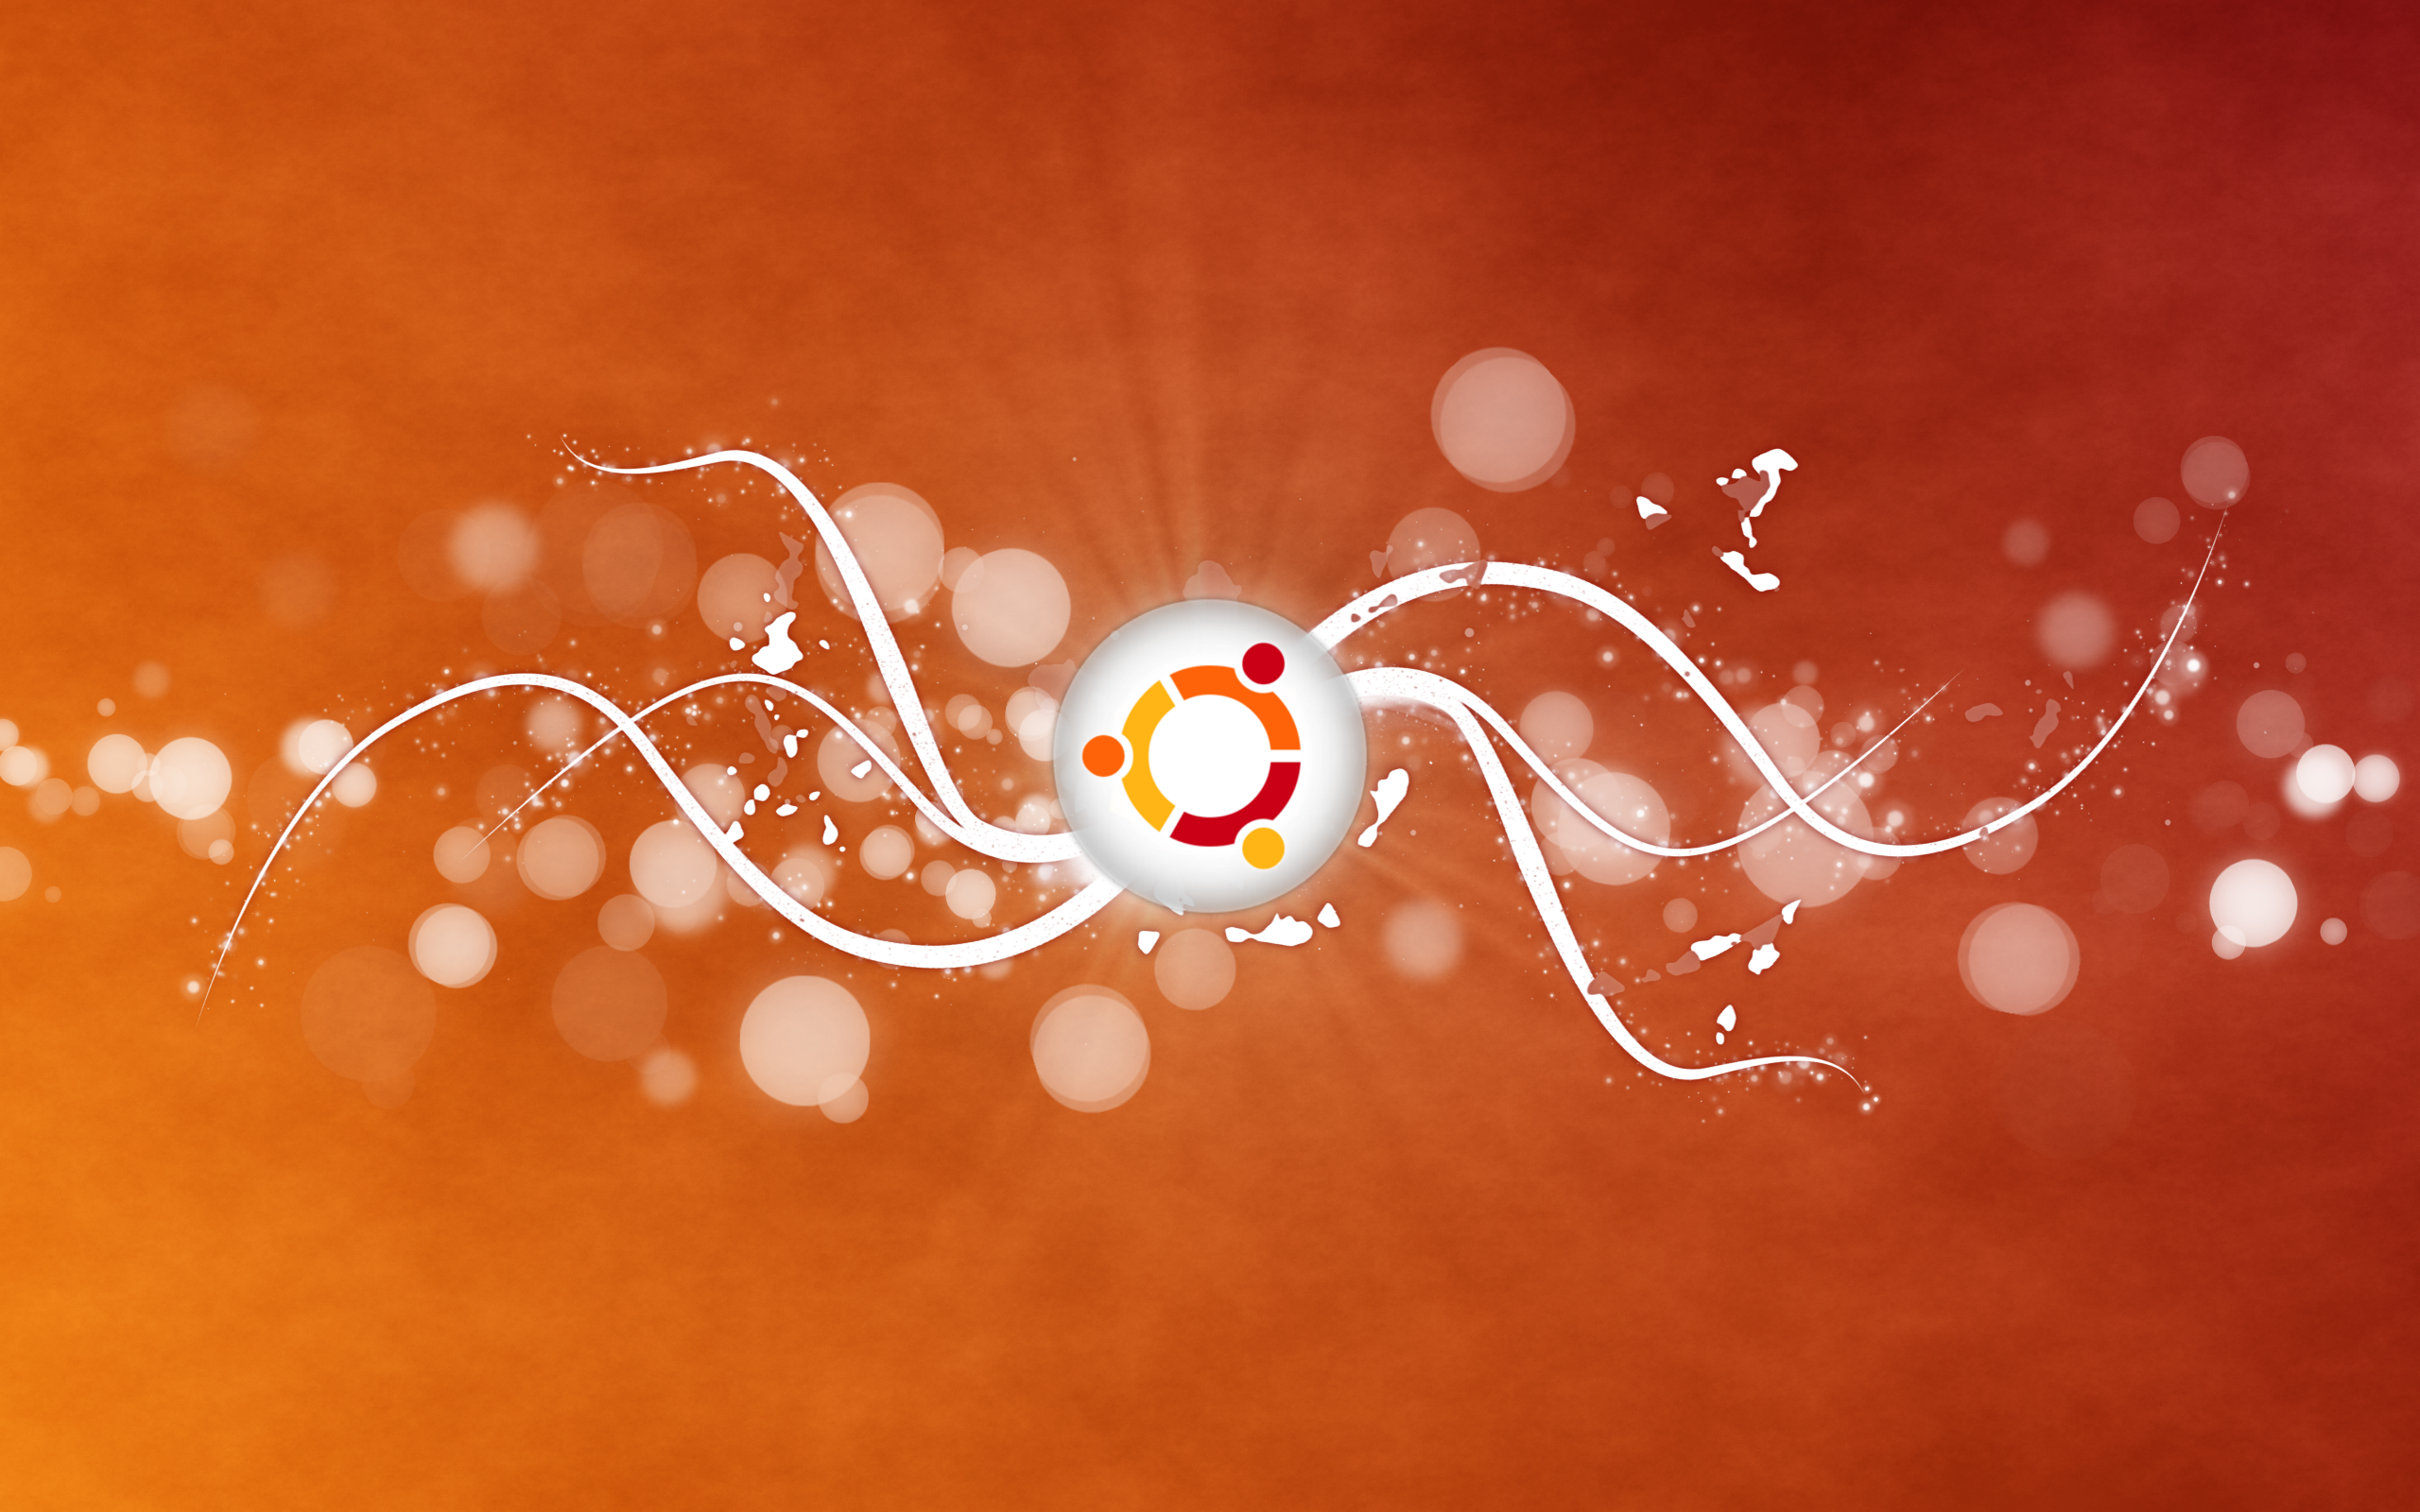 Abstract Ubuntu Wallpaper by sonicboom1226